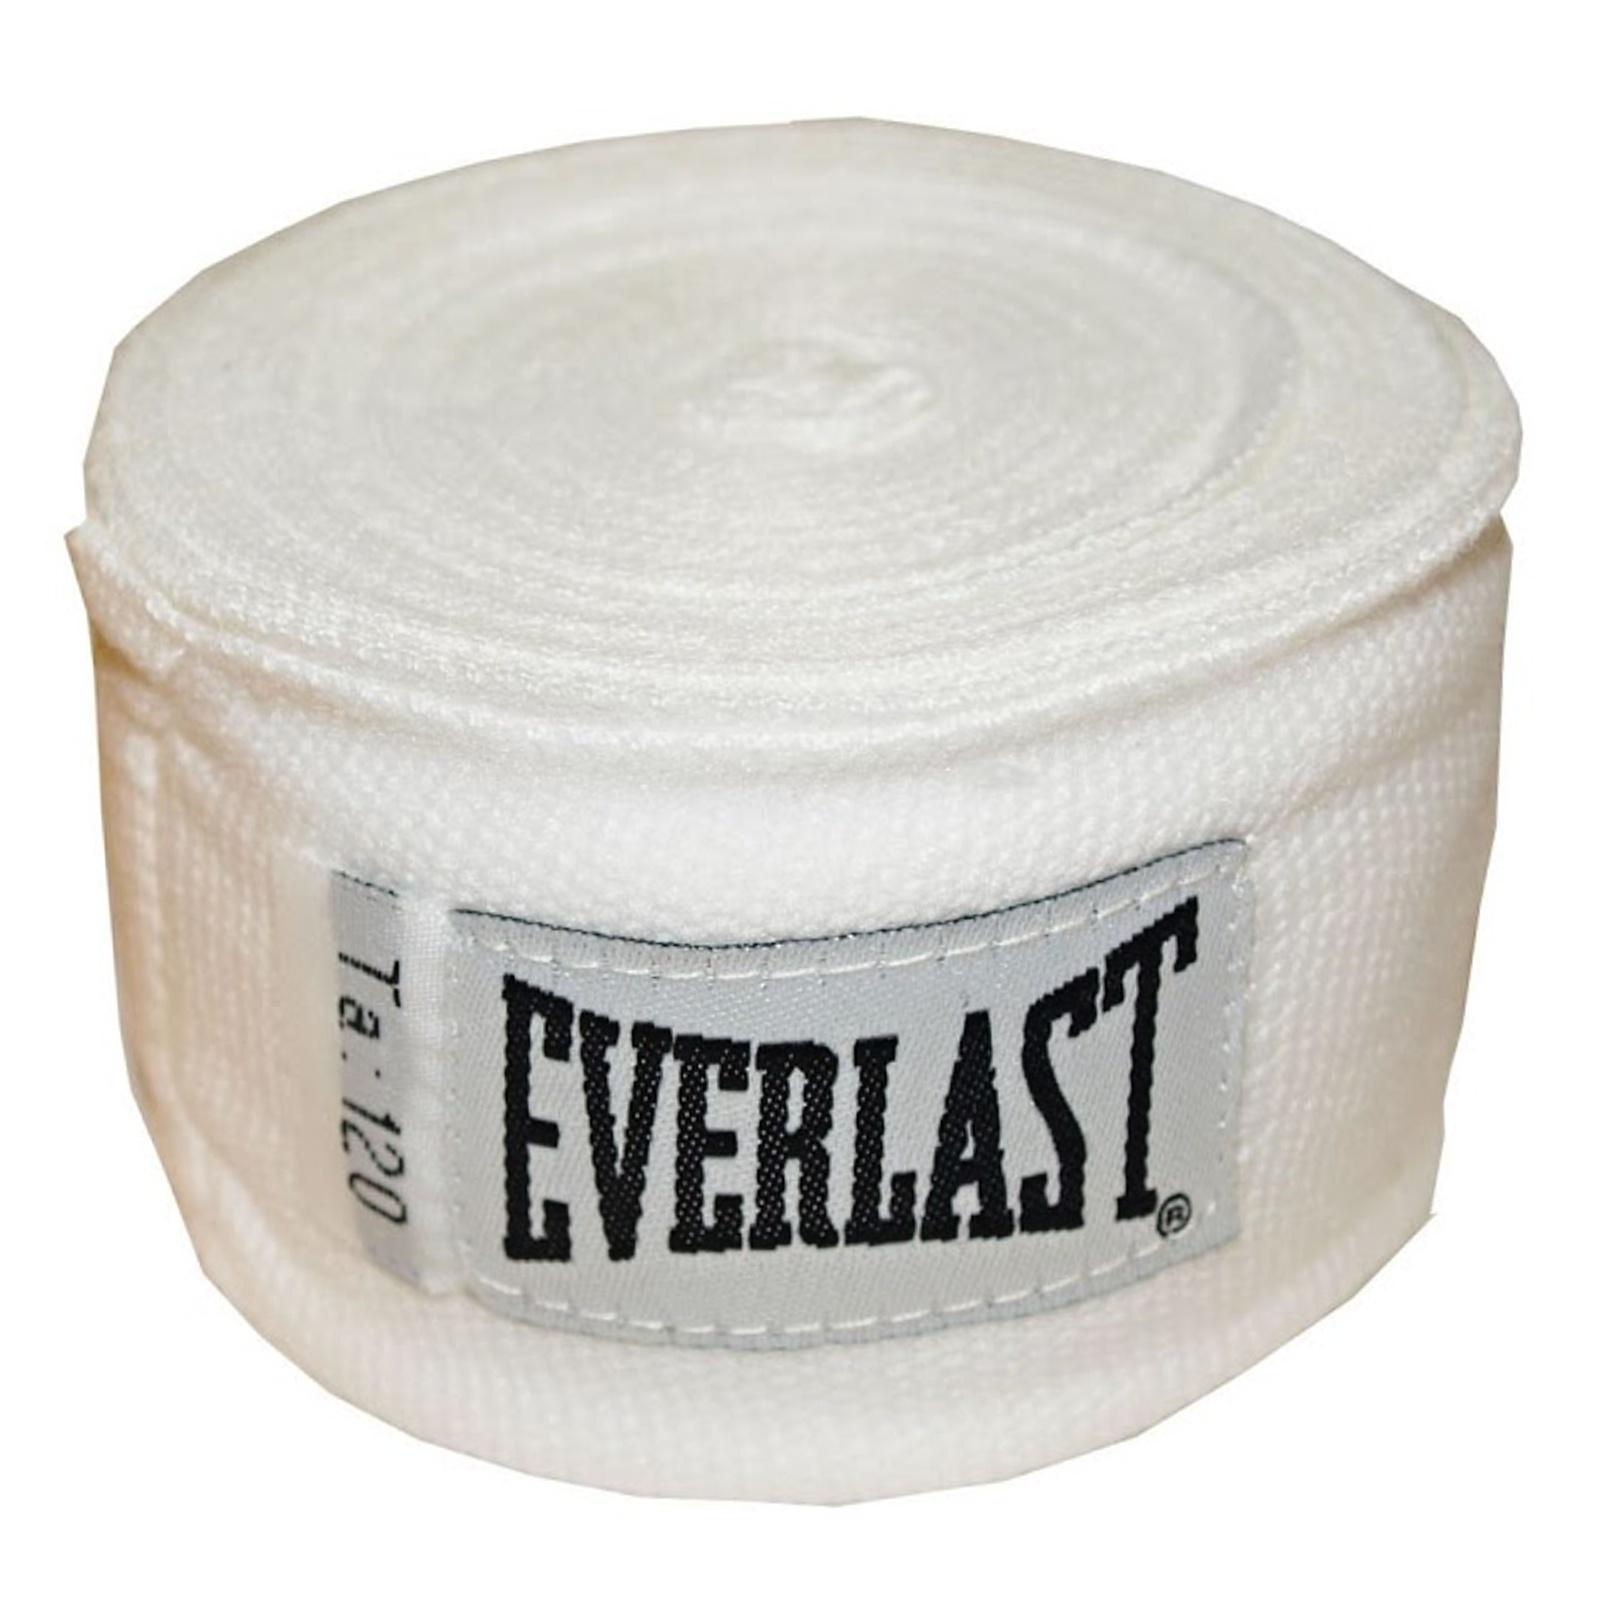 Bandáže EVERLAST 3 m biele - poloelastické